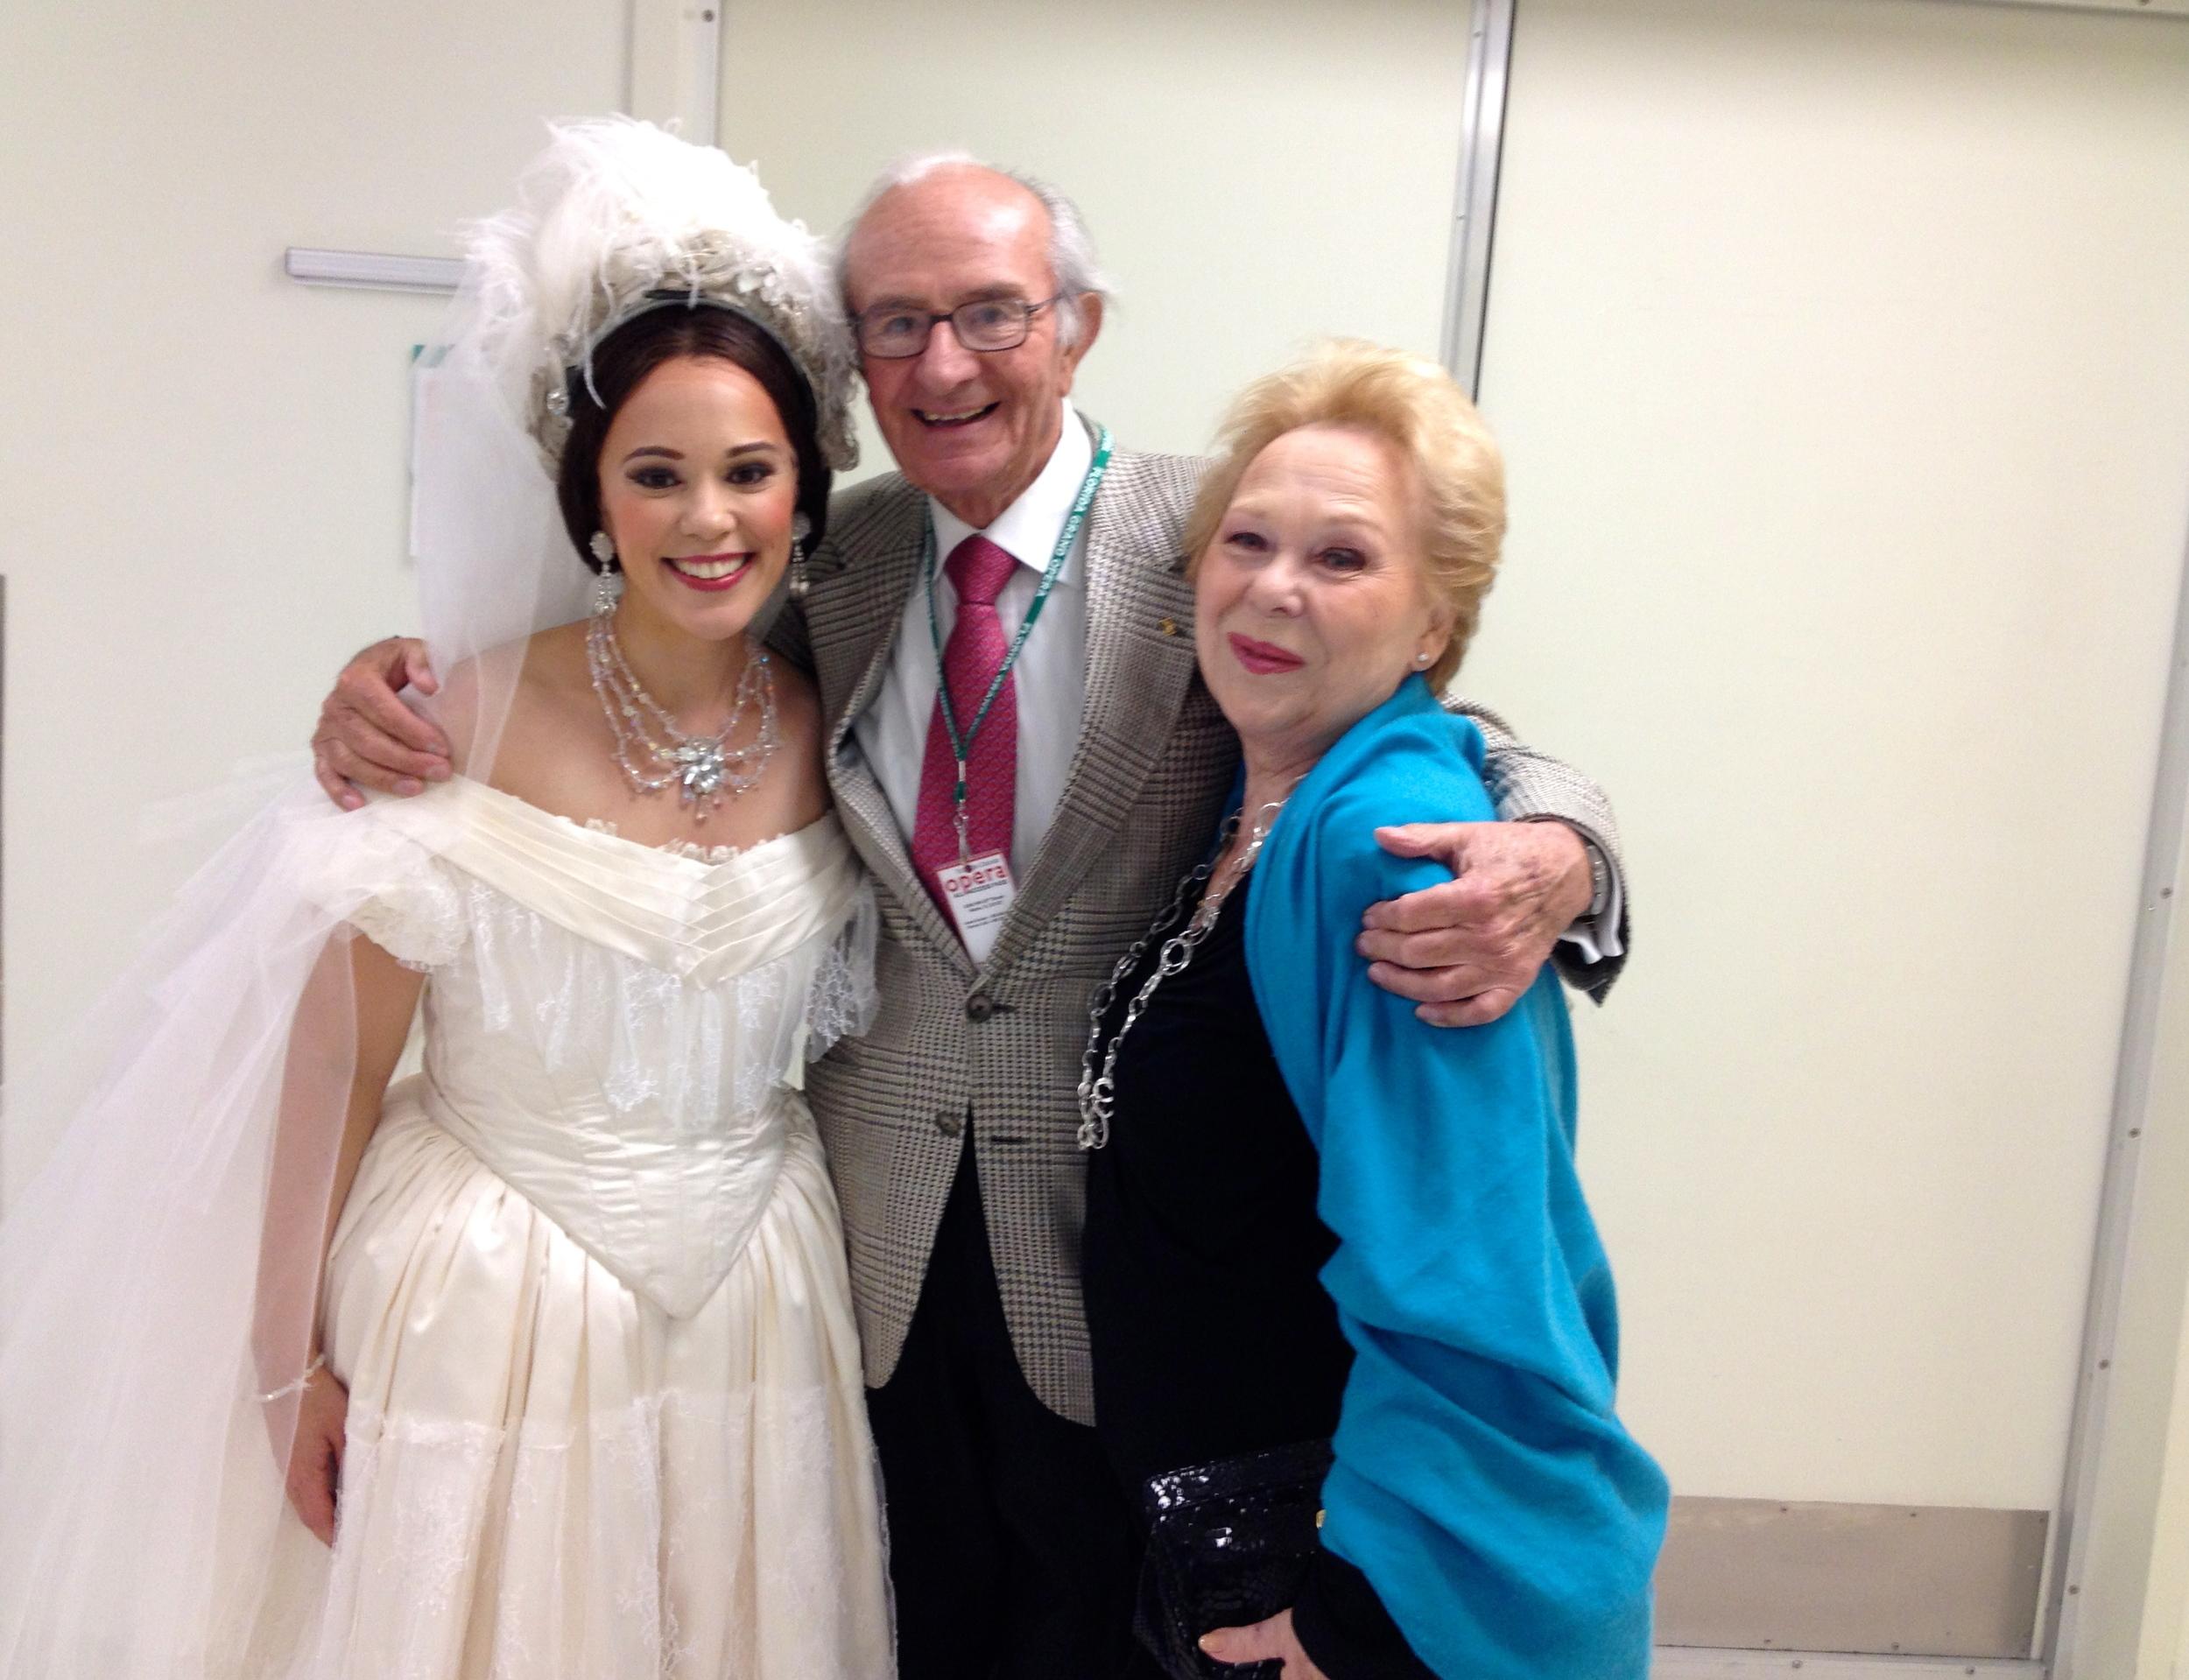 With Renata Scotto and Lorenzo Anselmi